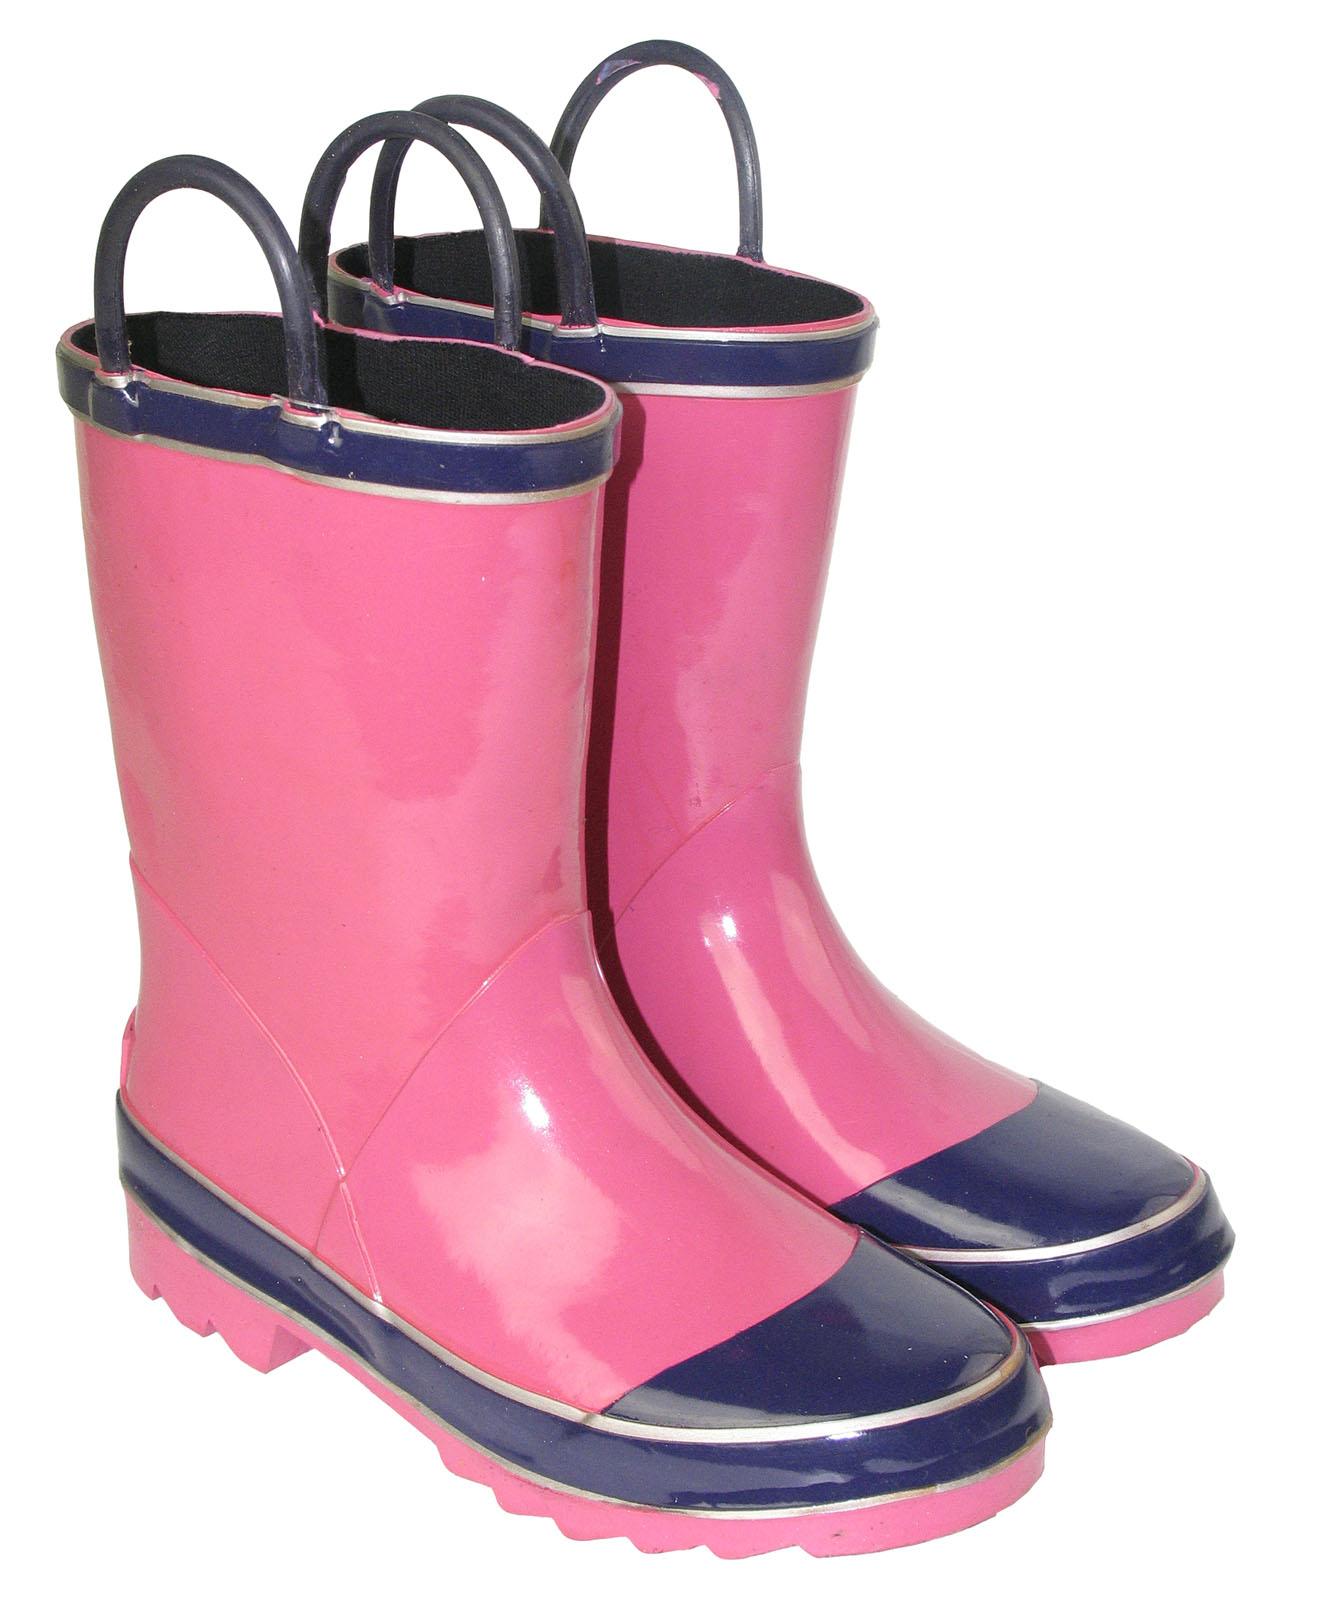 1328x1620 Clipart Rain Boots Clip Art Library